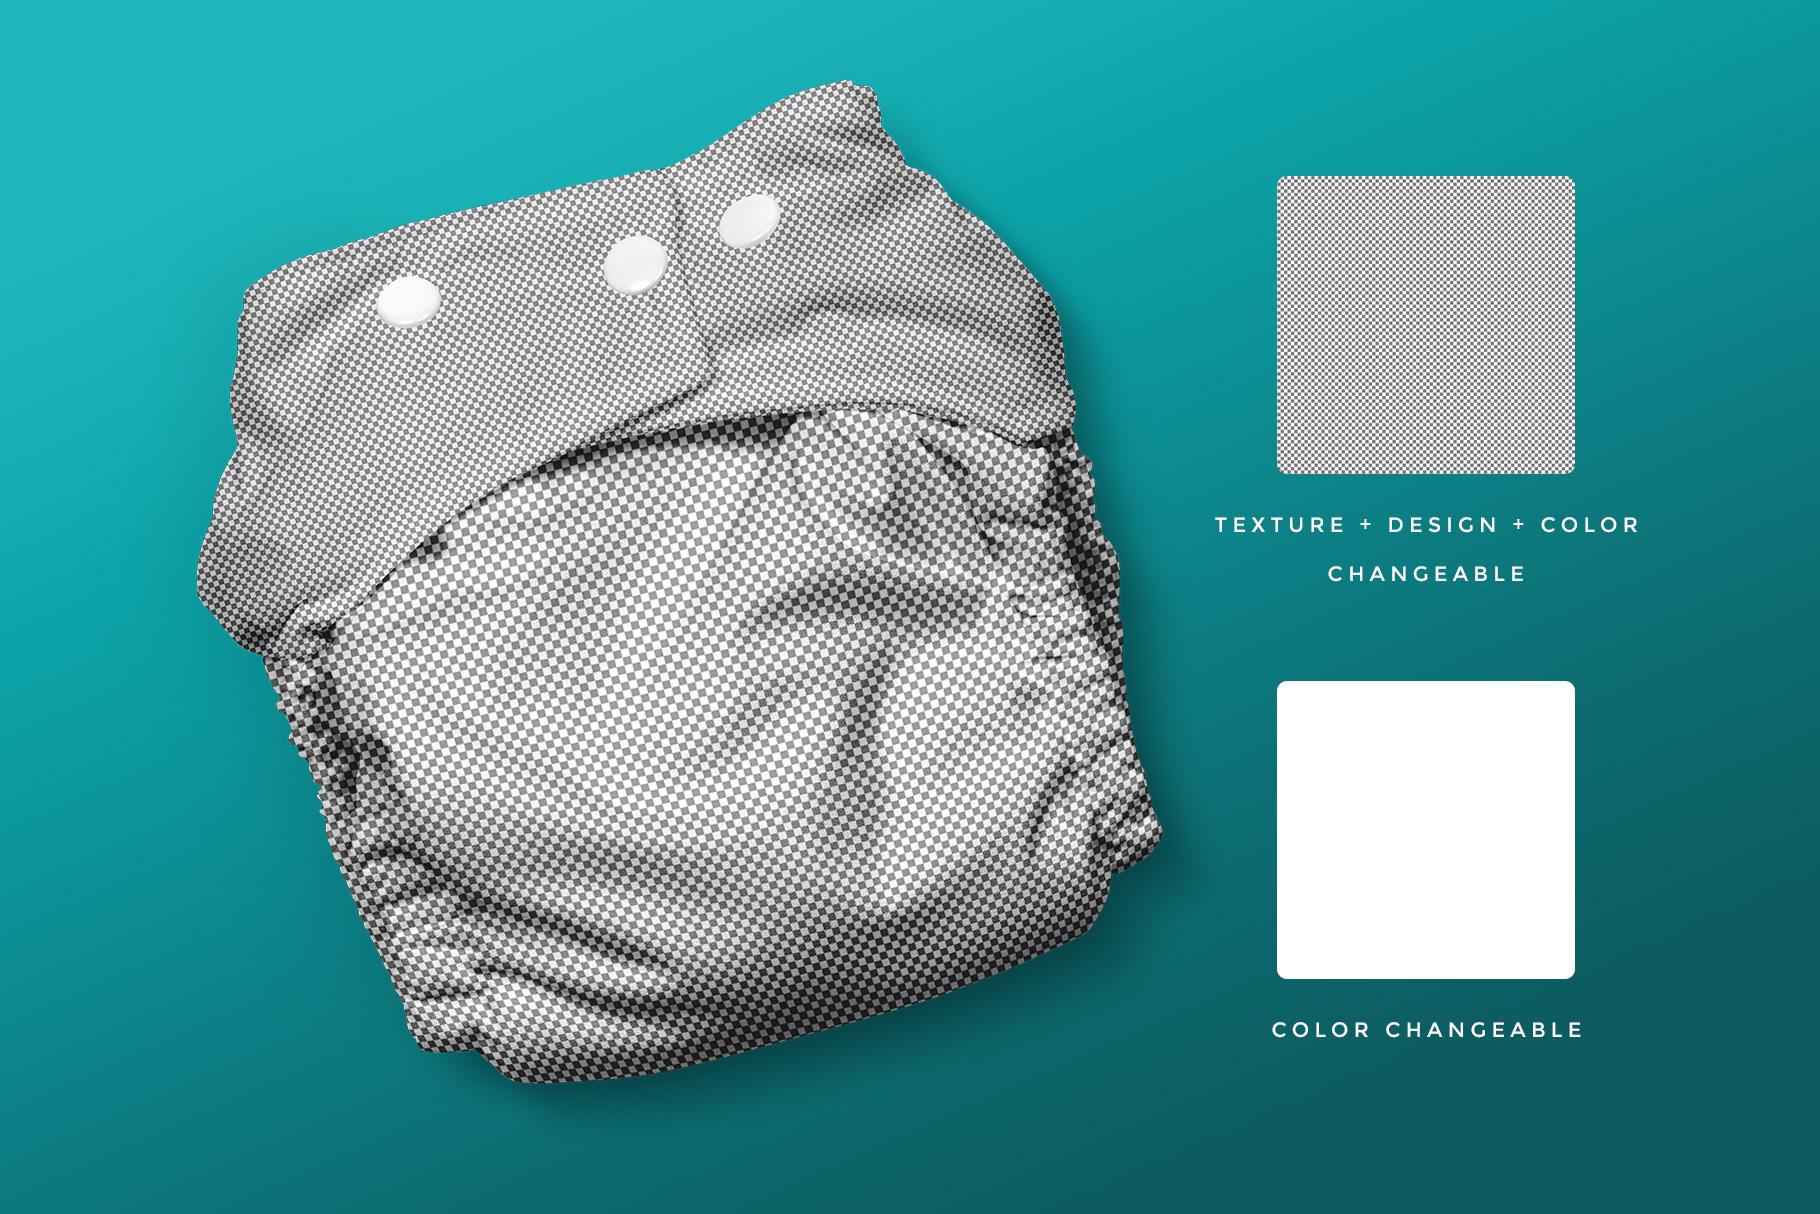 editability of the reusable cloth diaper mockup